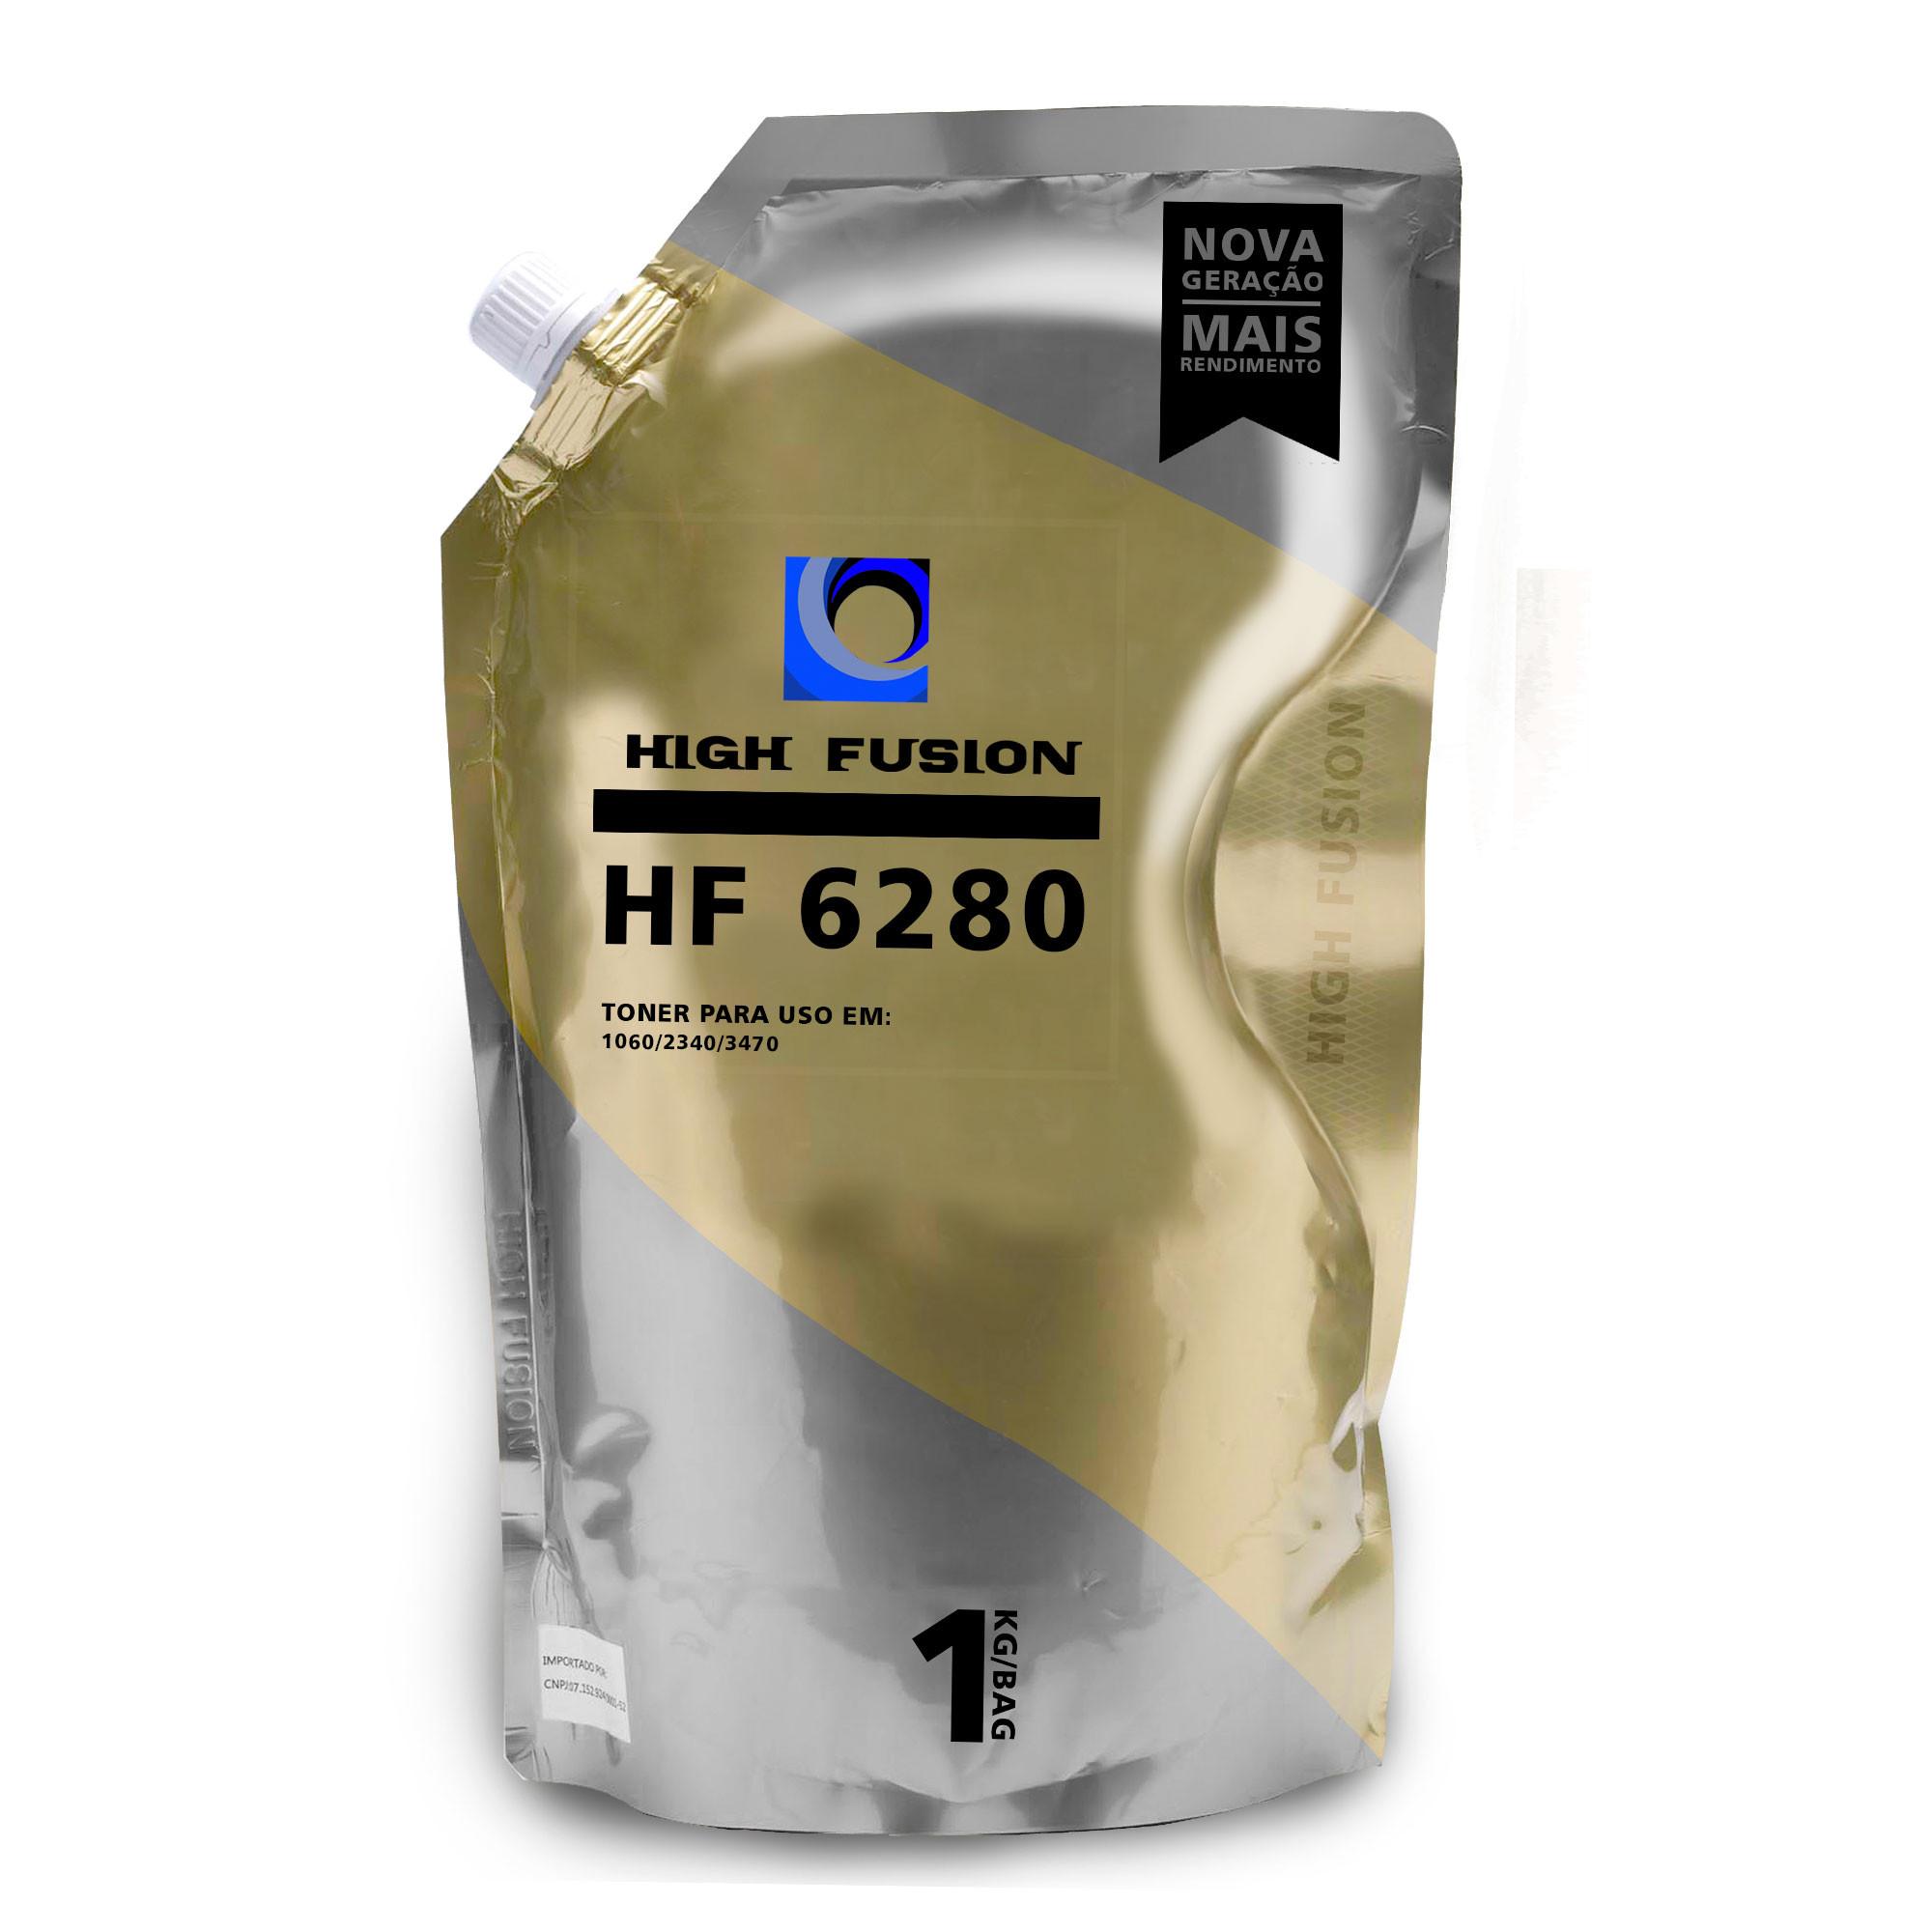 PO DE TONER BROTHER HIGH FUSION HF6280 C/ 1060/2340/3470 BAG 1KG